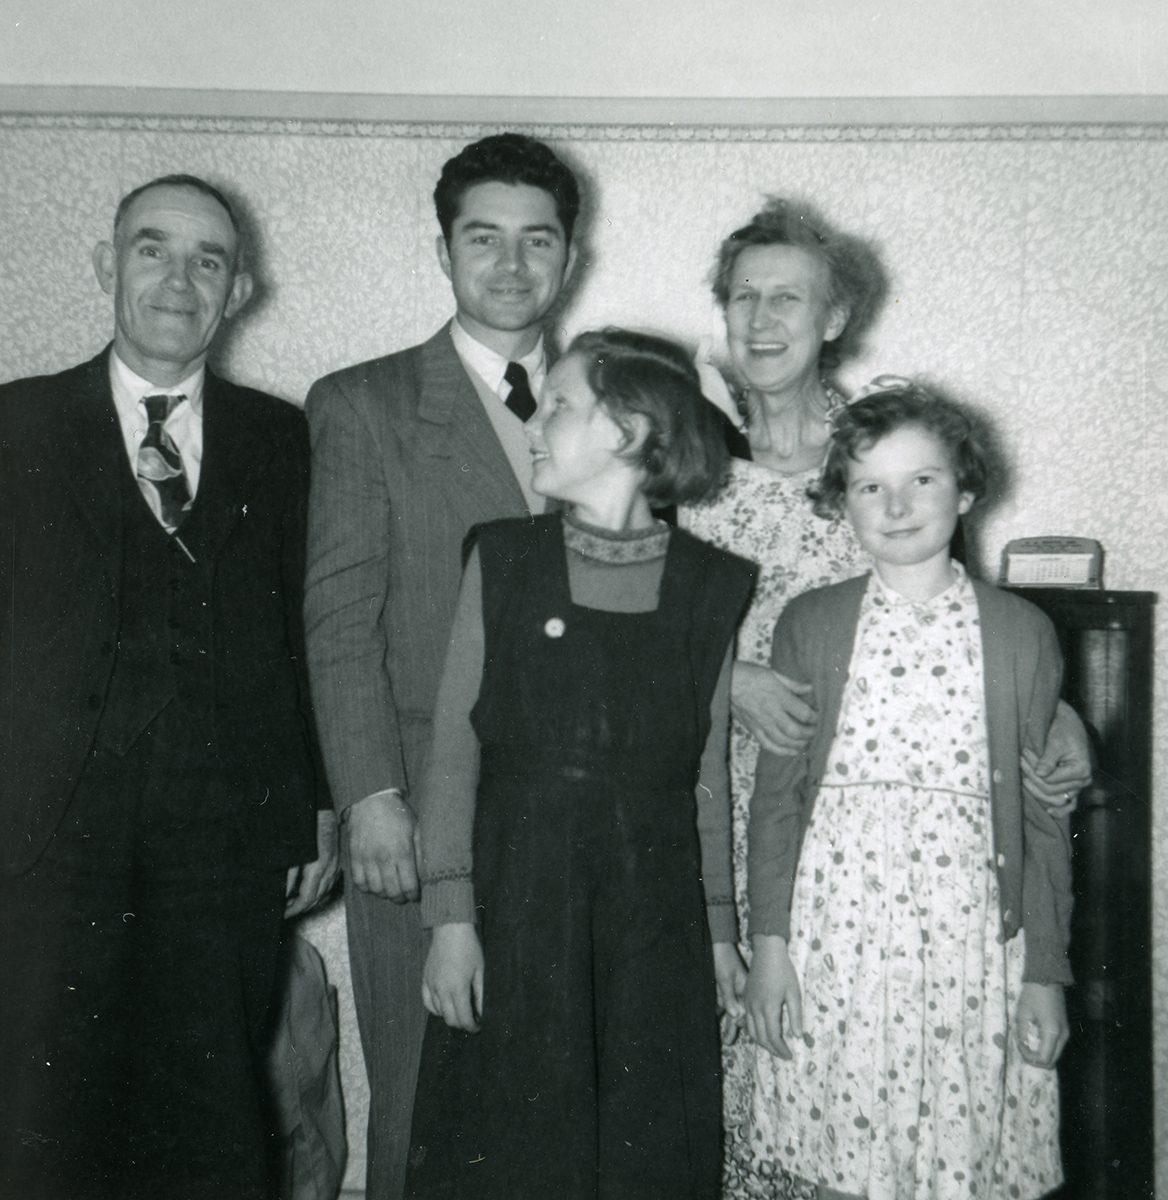 McNally // Boston & Lurgan :: Patrick McNally with some of the McAtasney family, Lurgan, N.Ireland, July, 1954